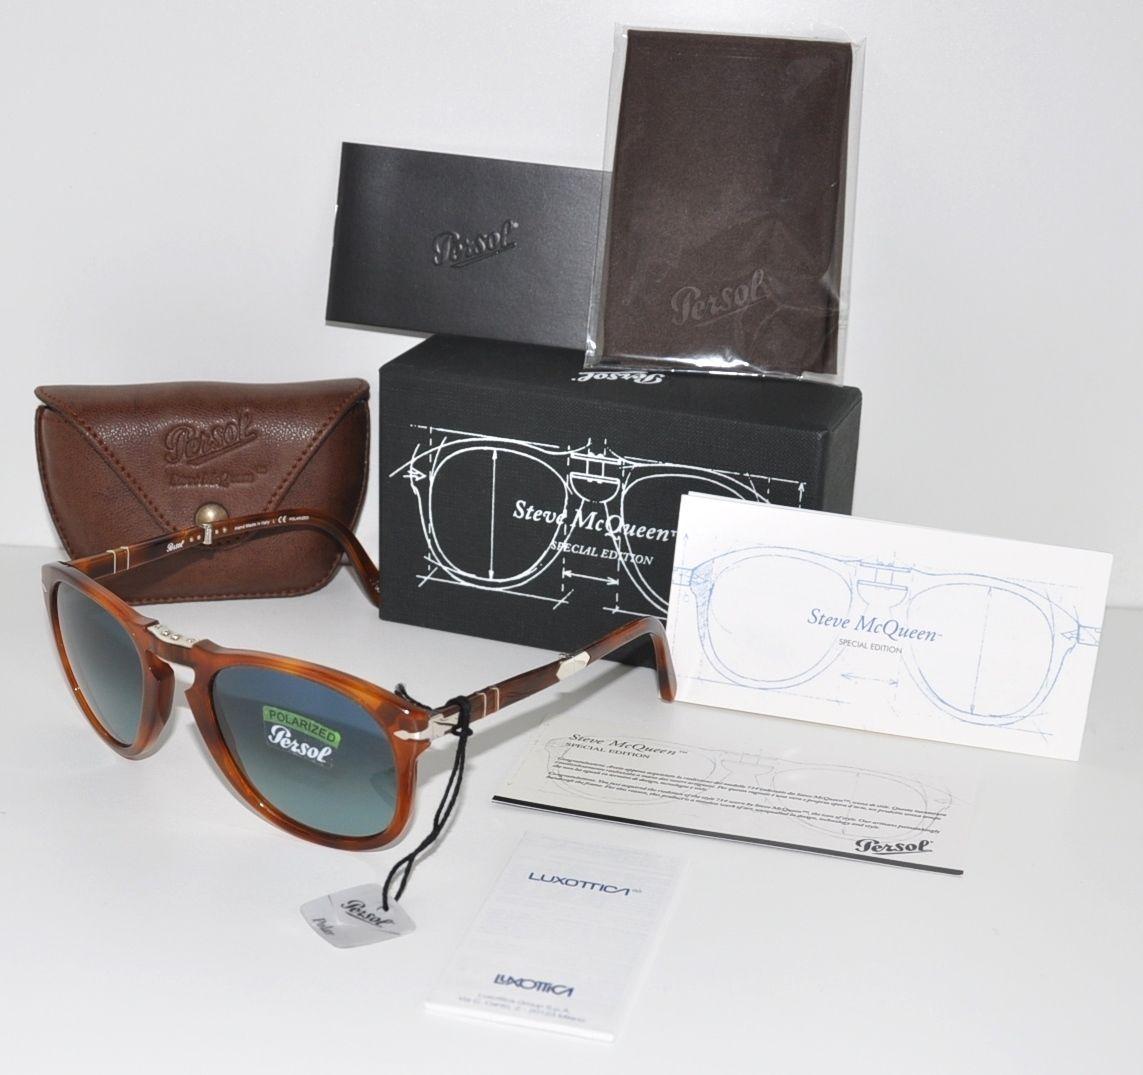 Persol Steve McQueen 714SM 96S3 Folding Sunglasses Light